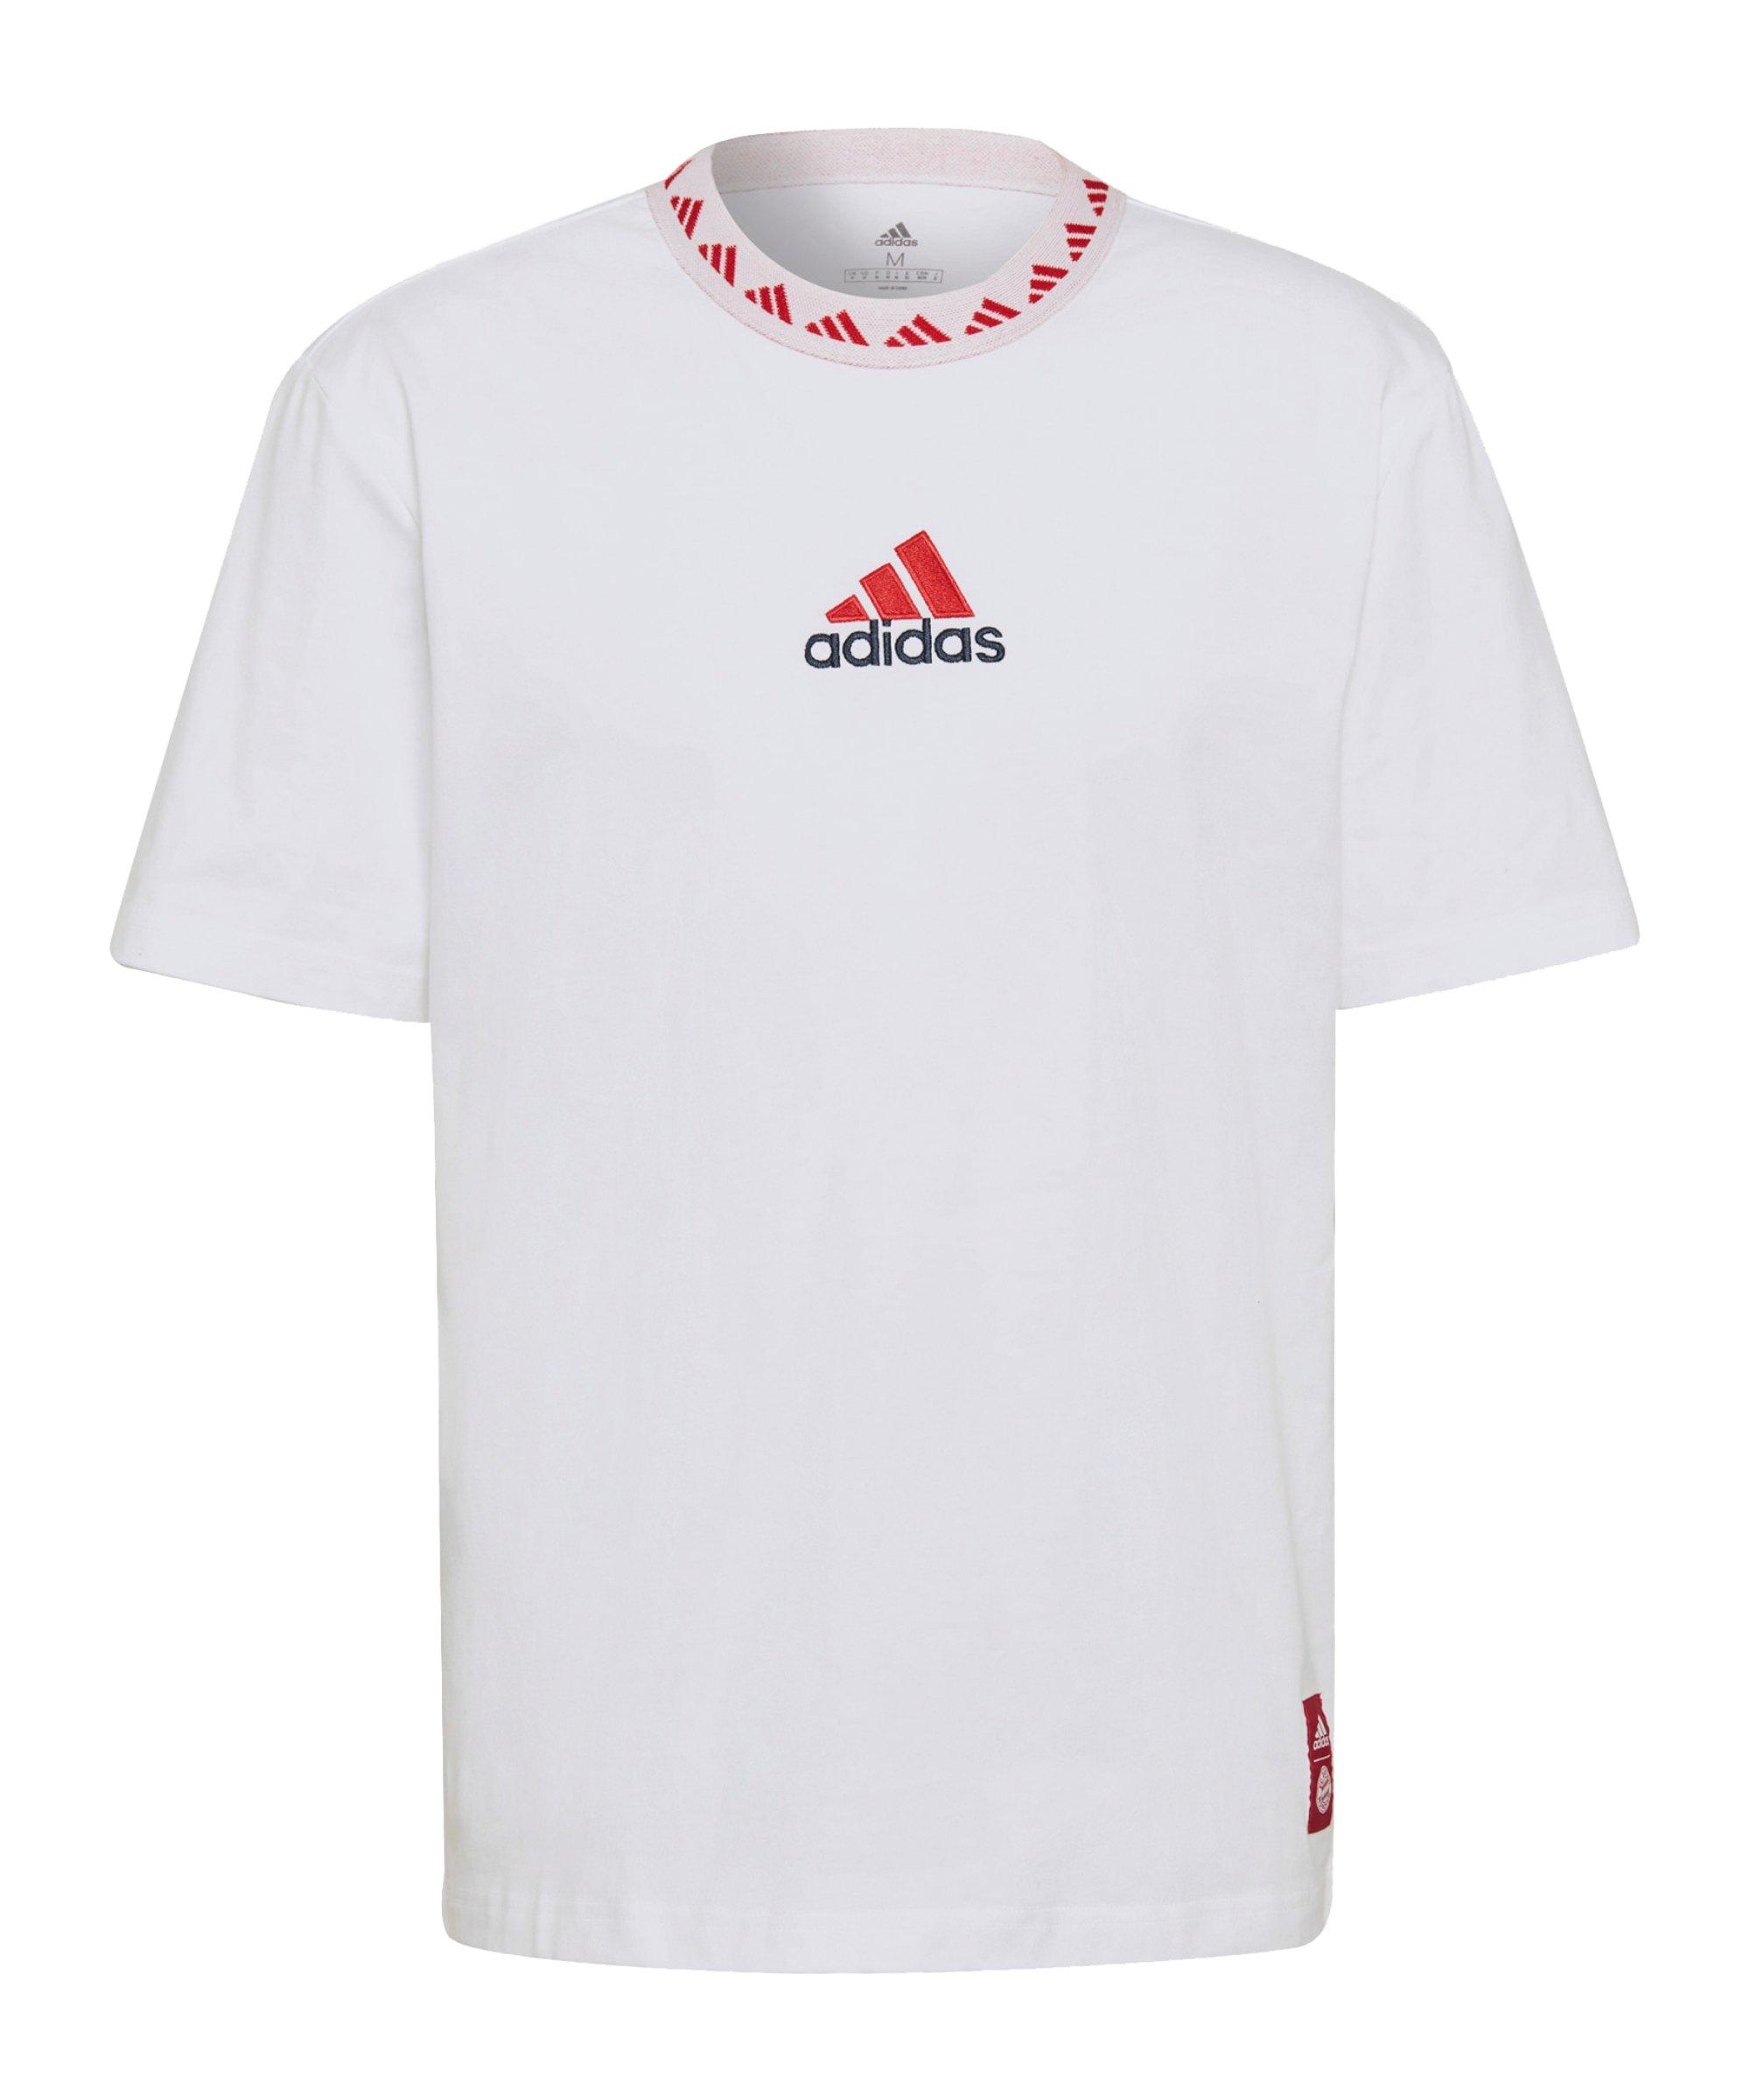 adidas FC Bayern München Icon T-Shirt Weiss - weiss